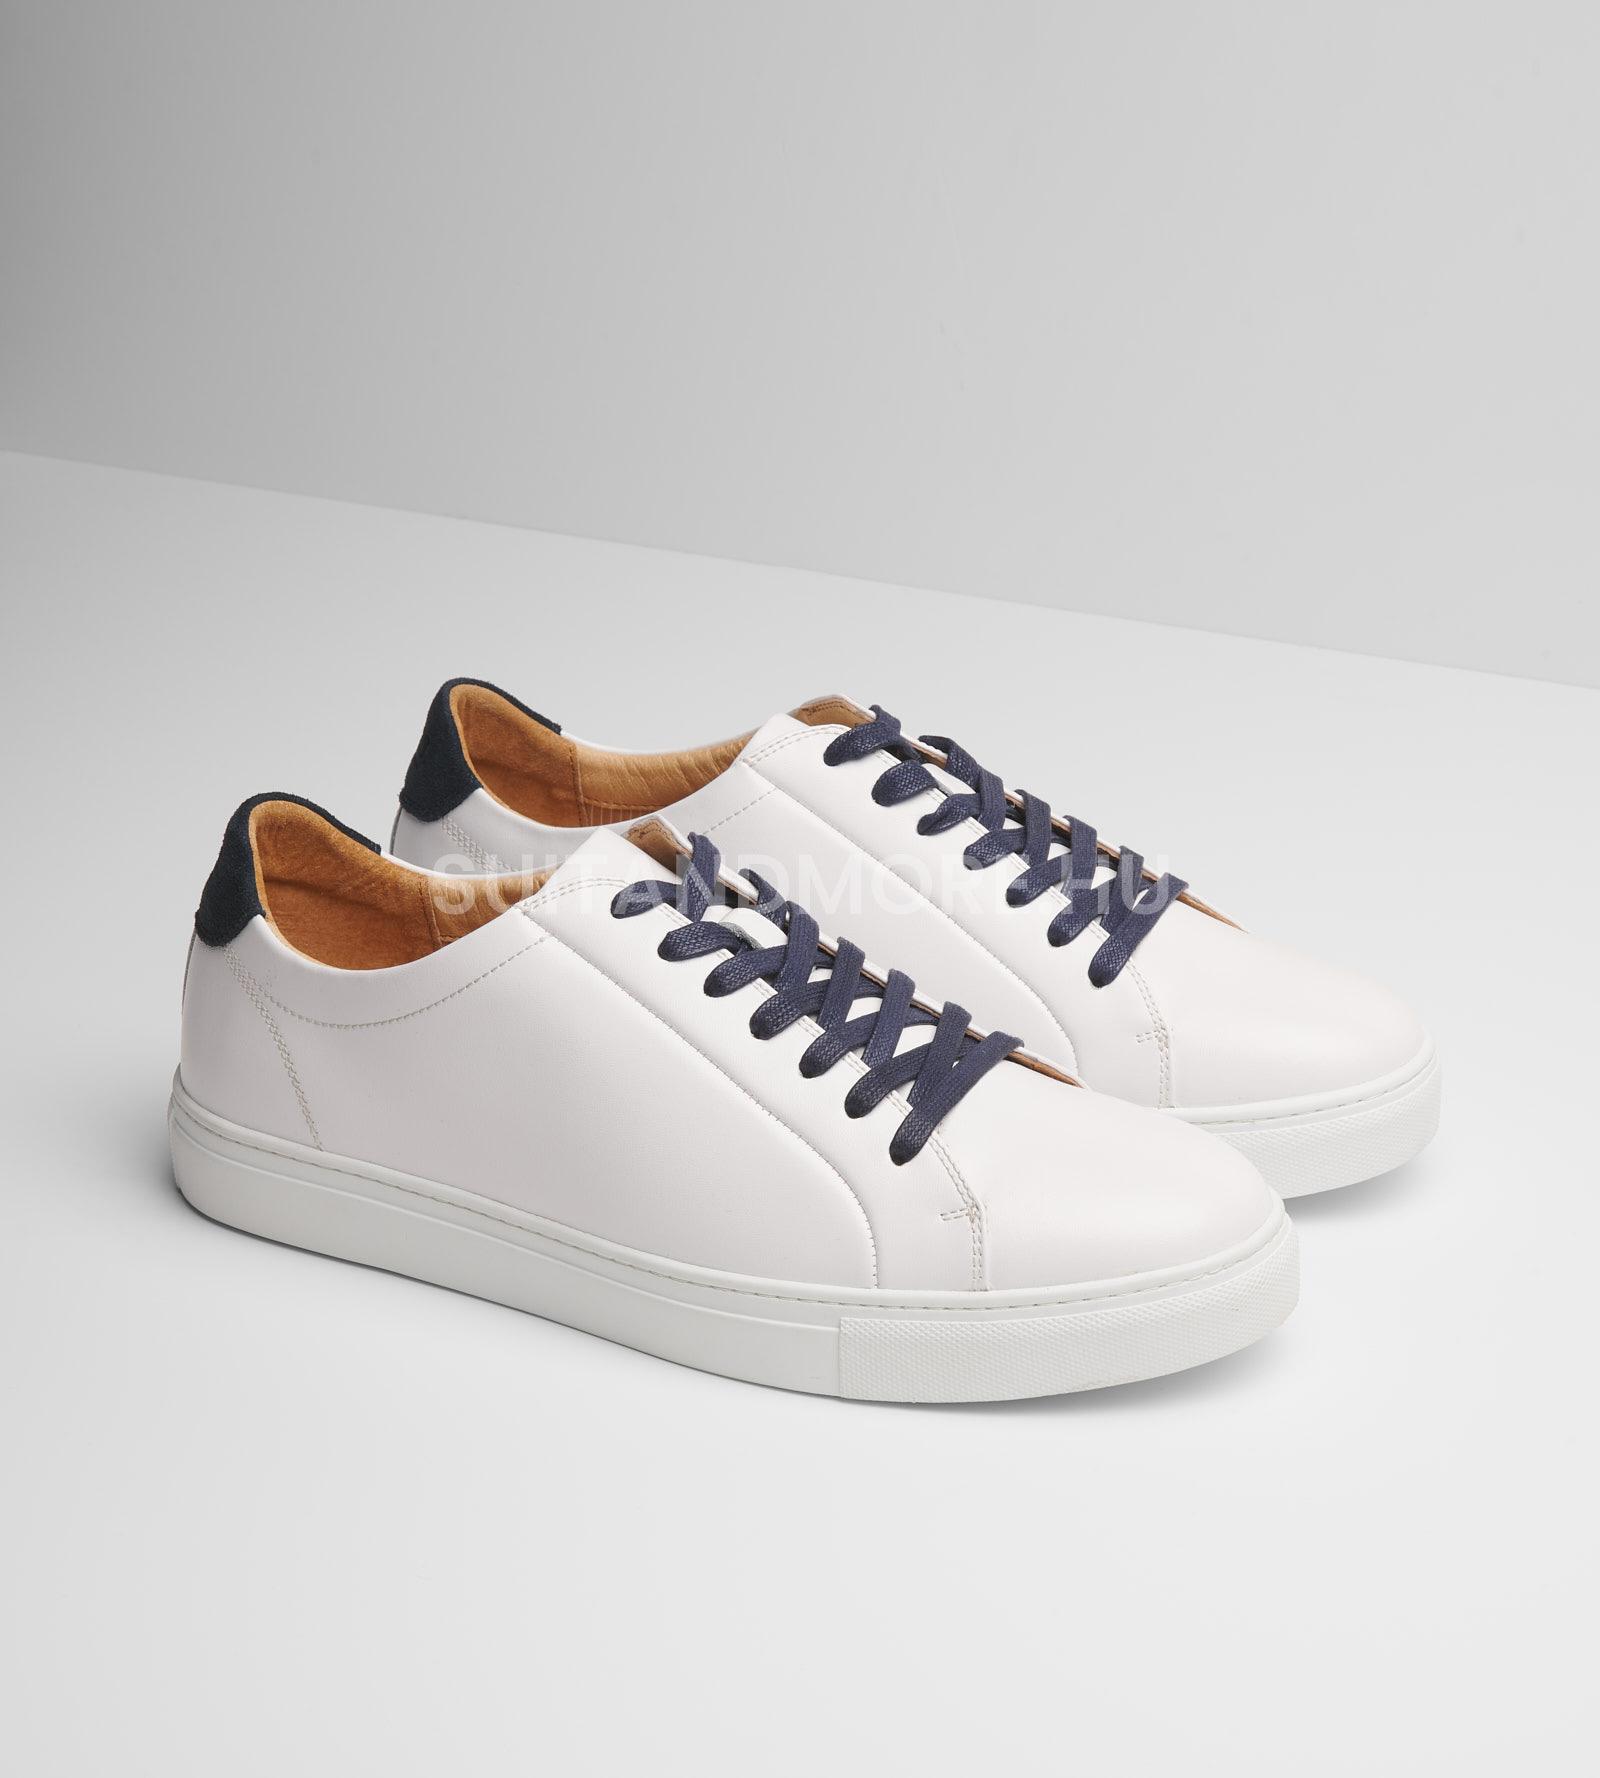 digel-feher-sneaker-cipo-seth-1199716-80-01